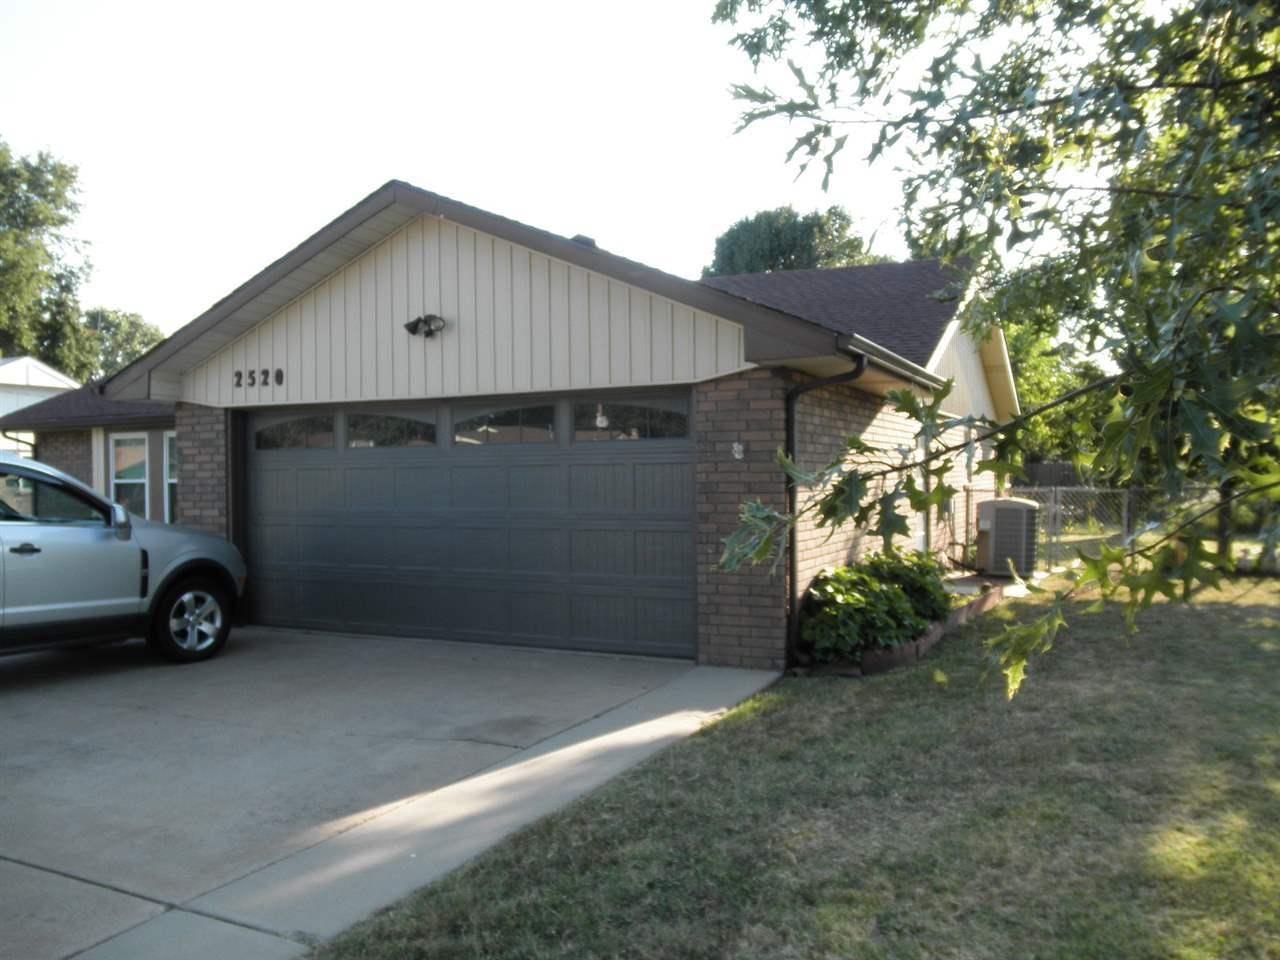 Sold Intraoffice W/MLS | 2520 Bonnie Ponca City, OK 74601 8